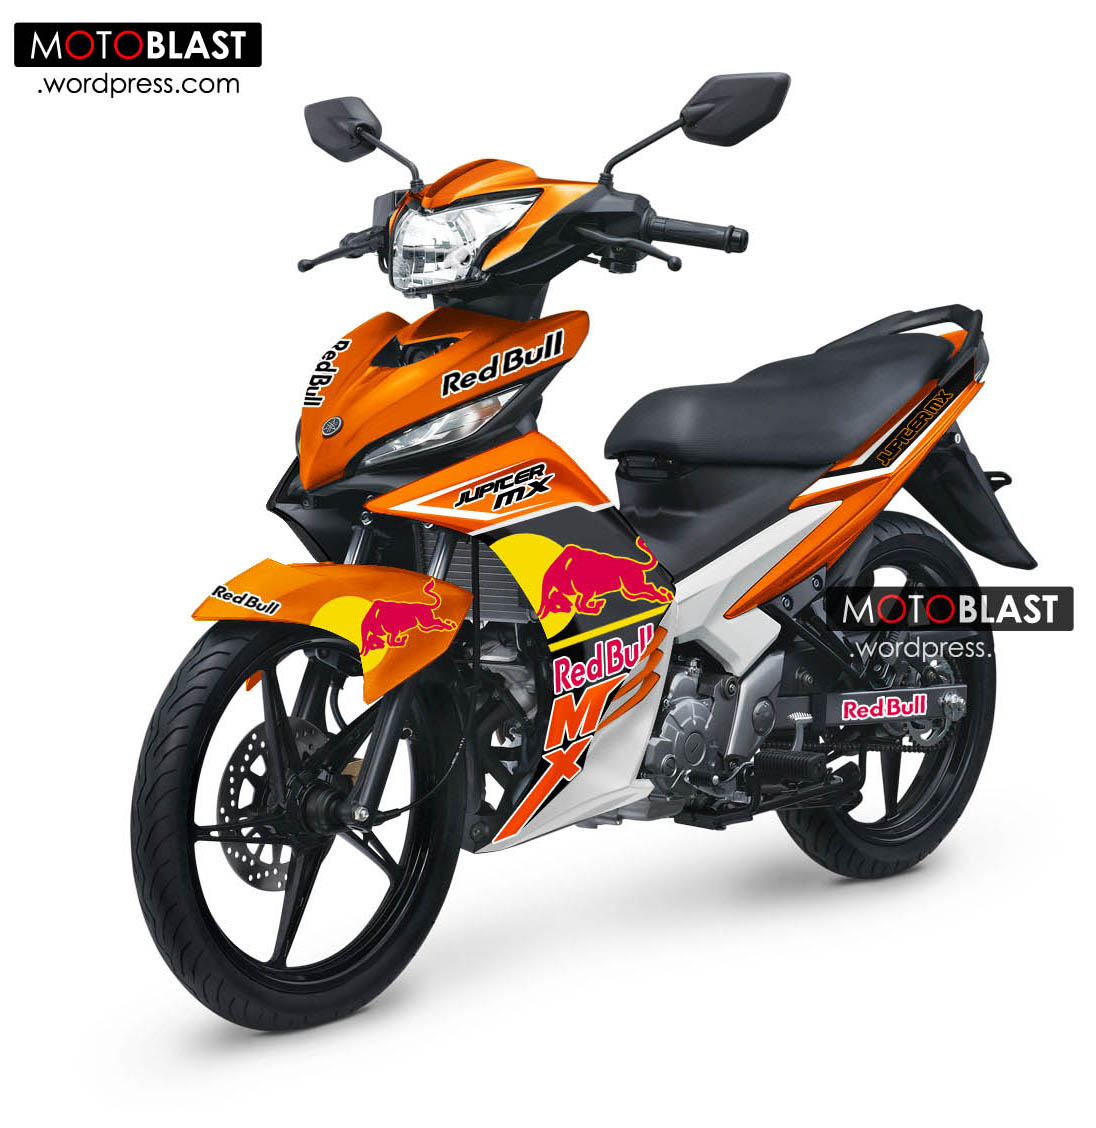 Tampilan Striping MotoGP 2014: New Vixion, Jupiter MX dan ...